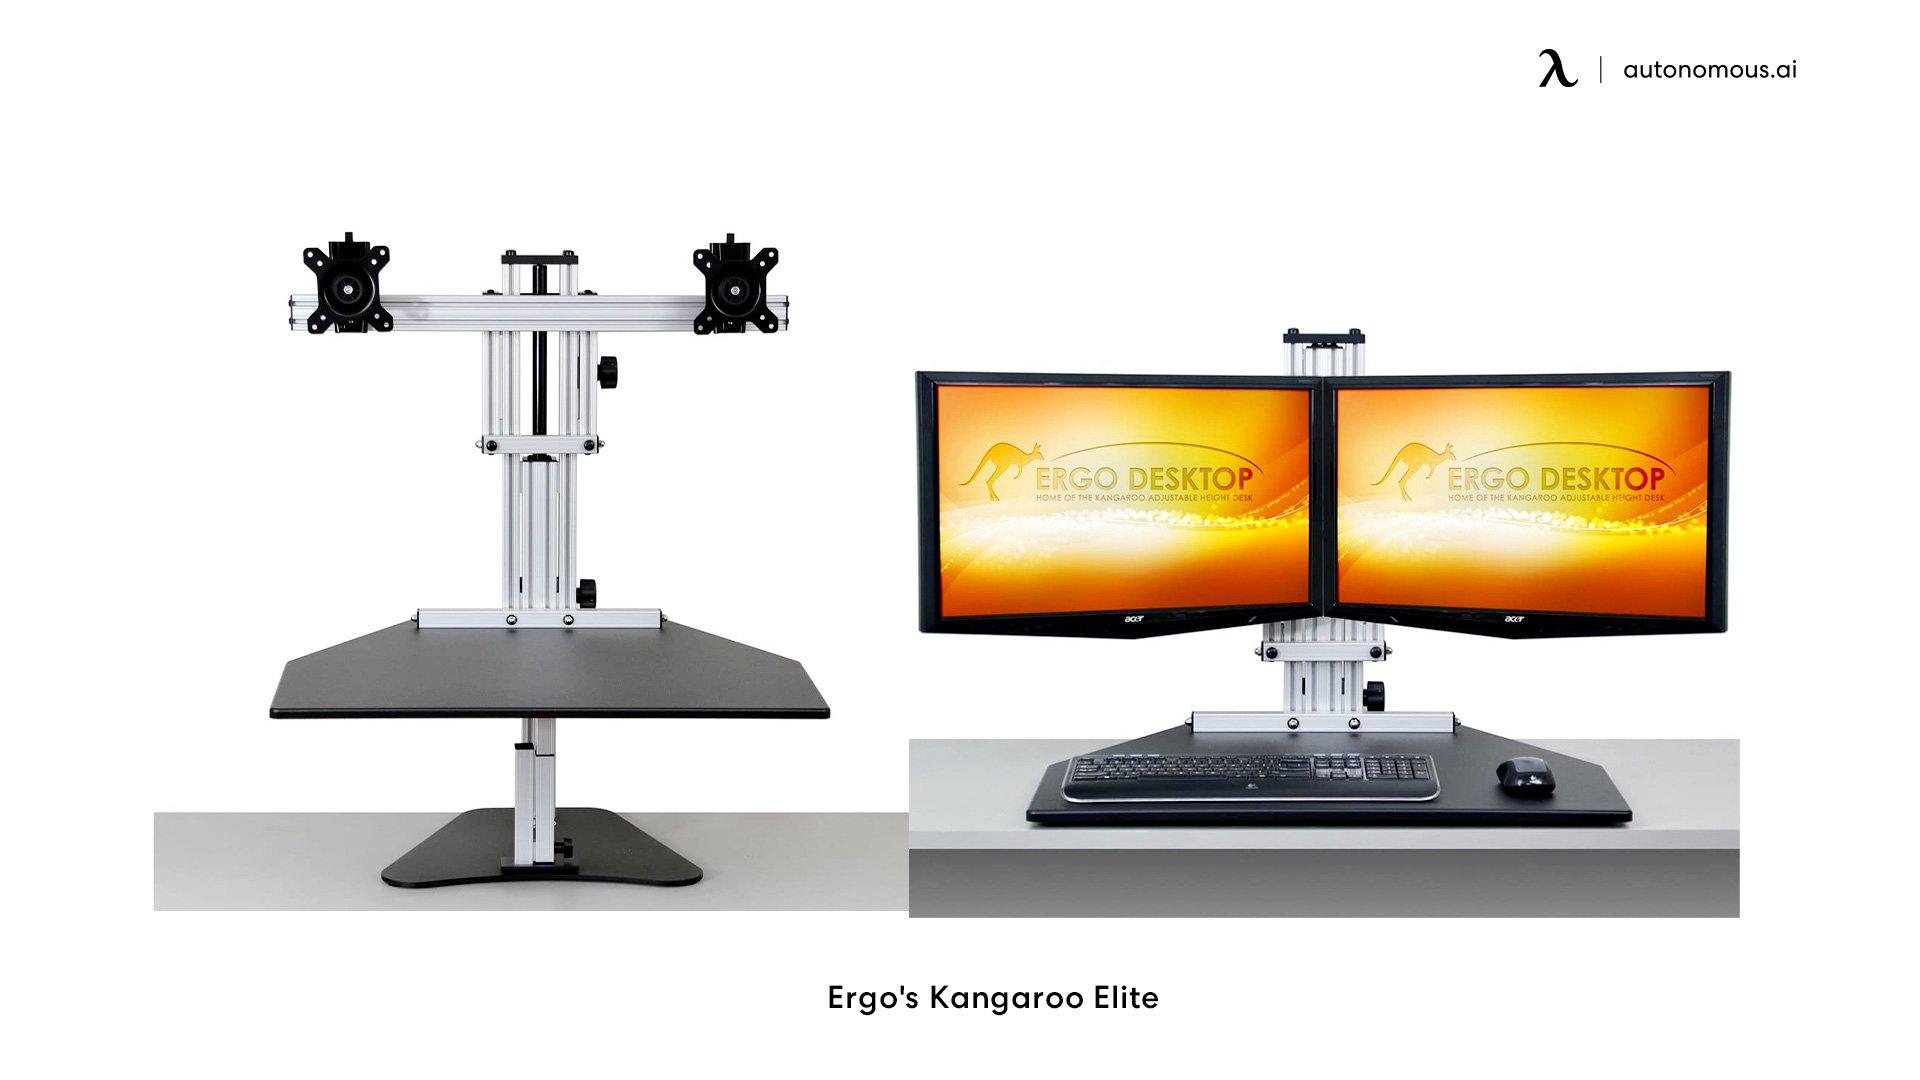 Ergo's Kangaroo Elite